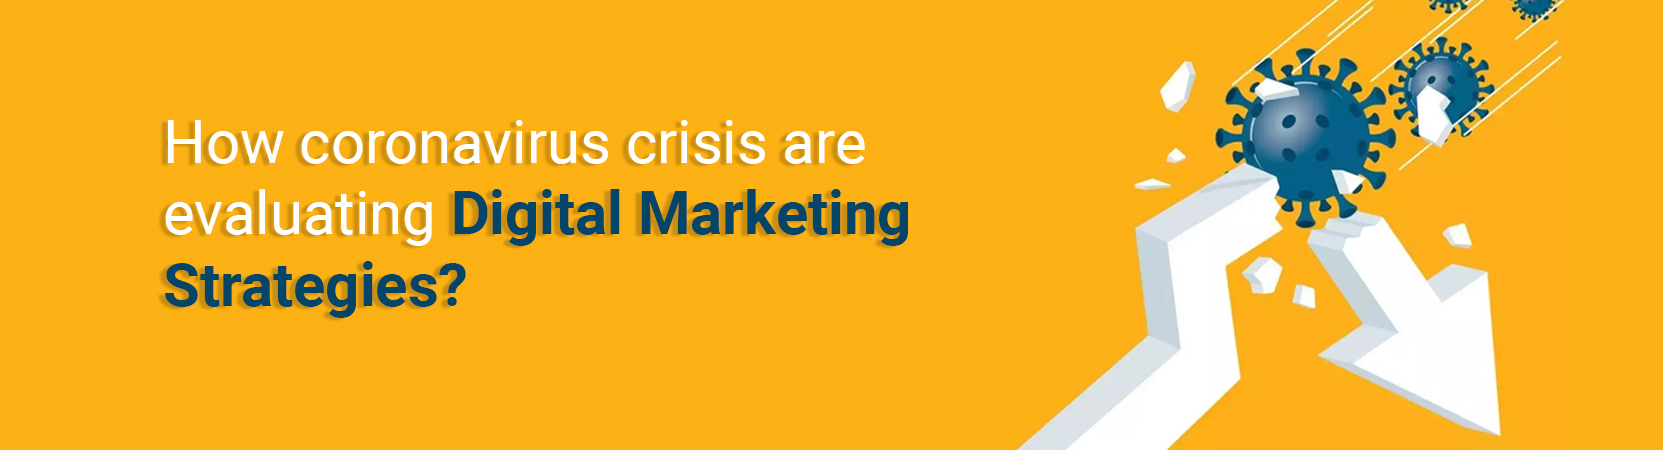 covid 19 impact on digital marketing